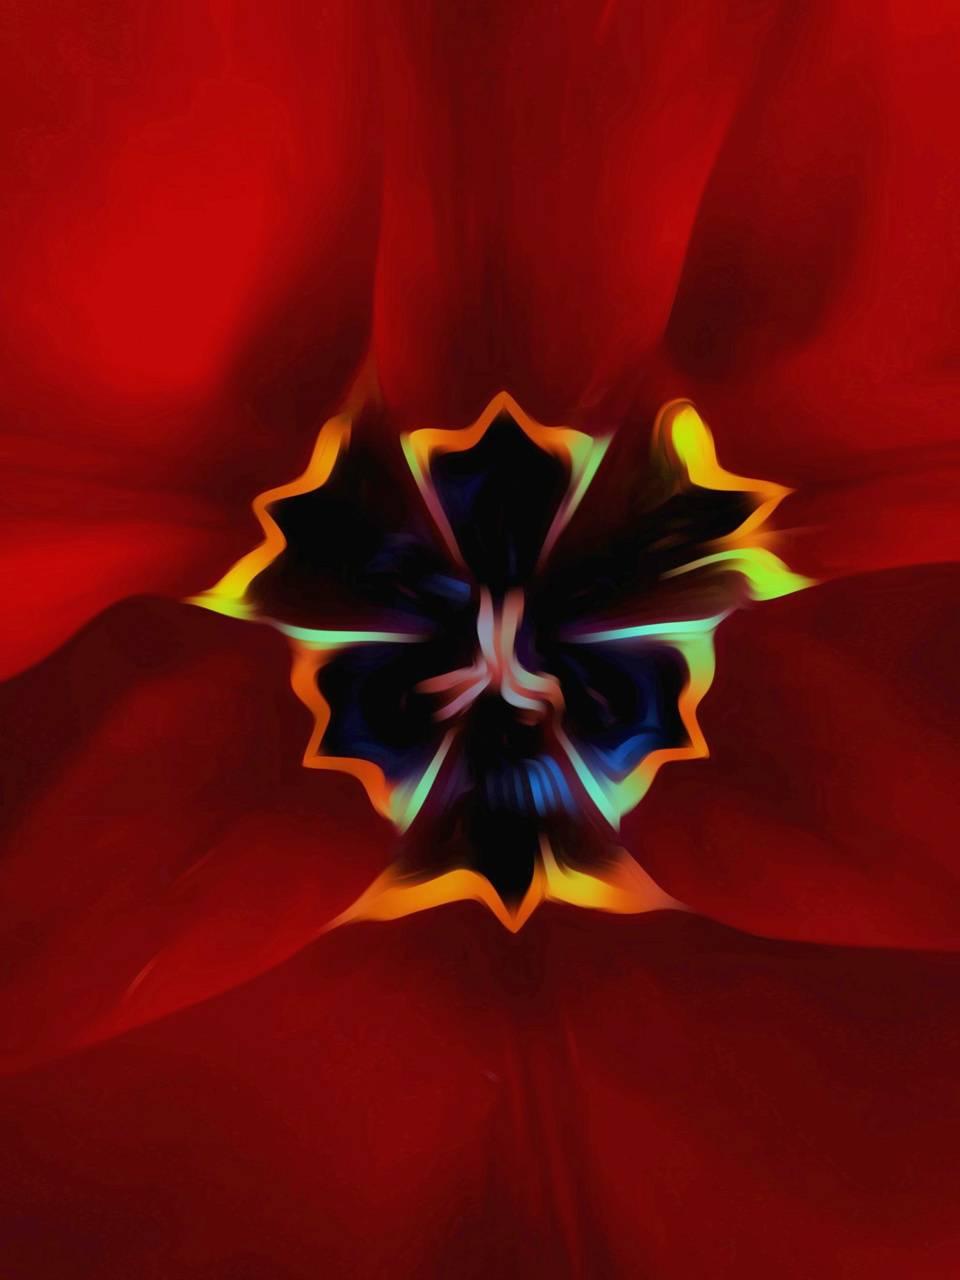 Red flower1 side